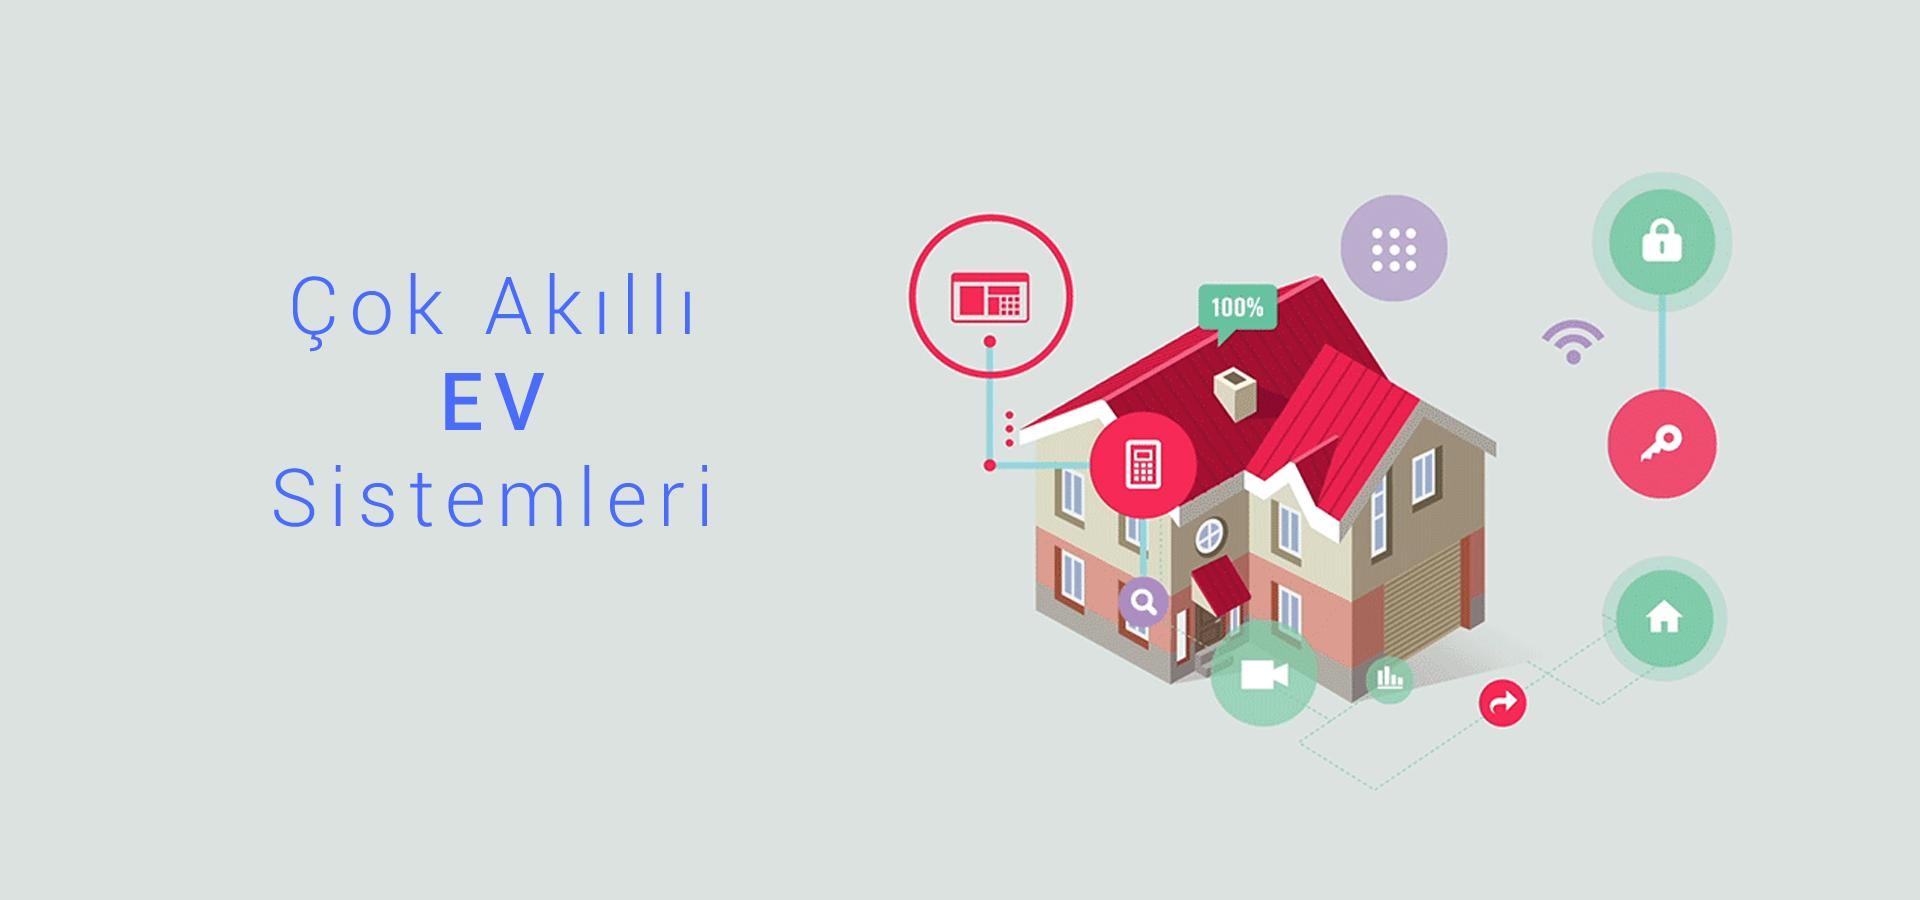 Akıllı Ev Sistemleri | Ev Otomasyon Sistemi